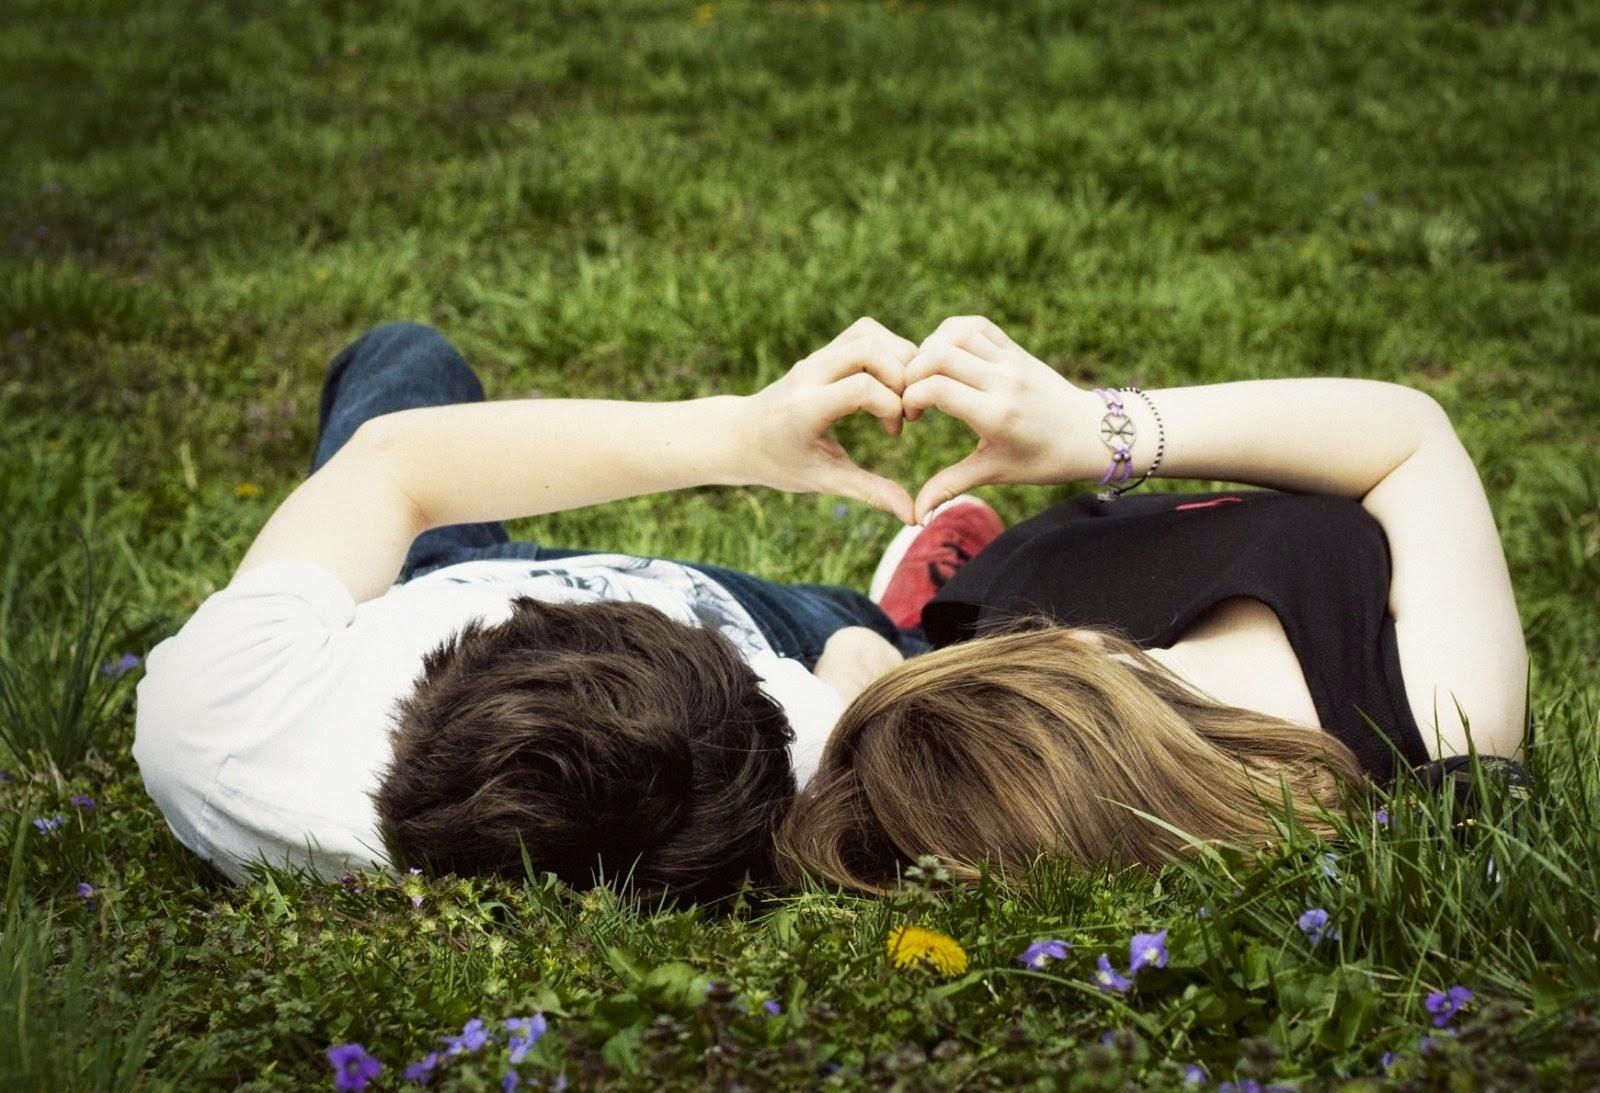 Frases de amor, tarde, primavera, mirada, mujer, vida.